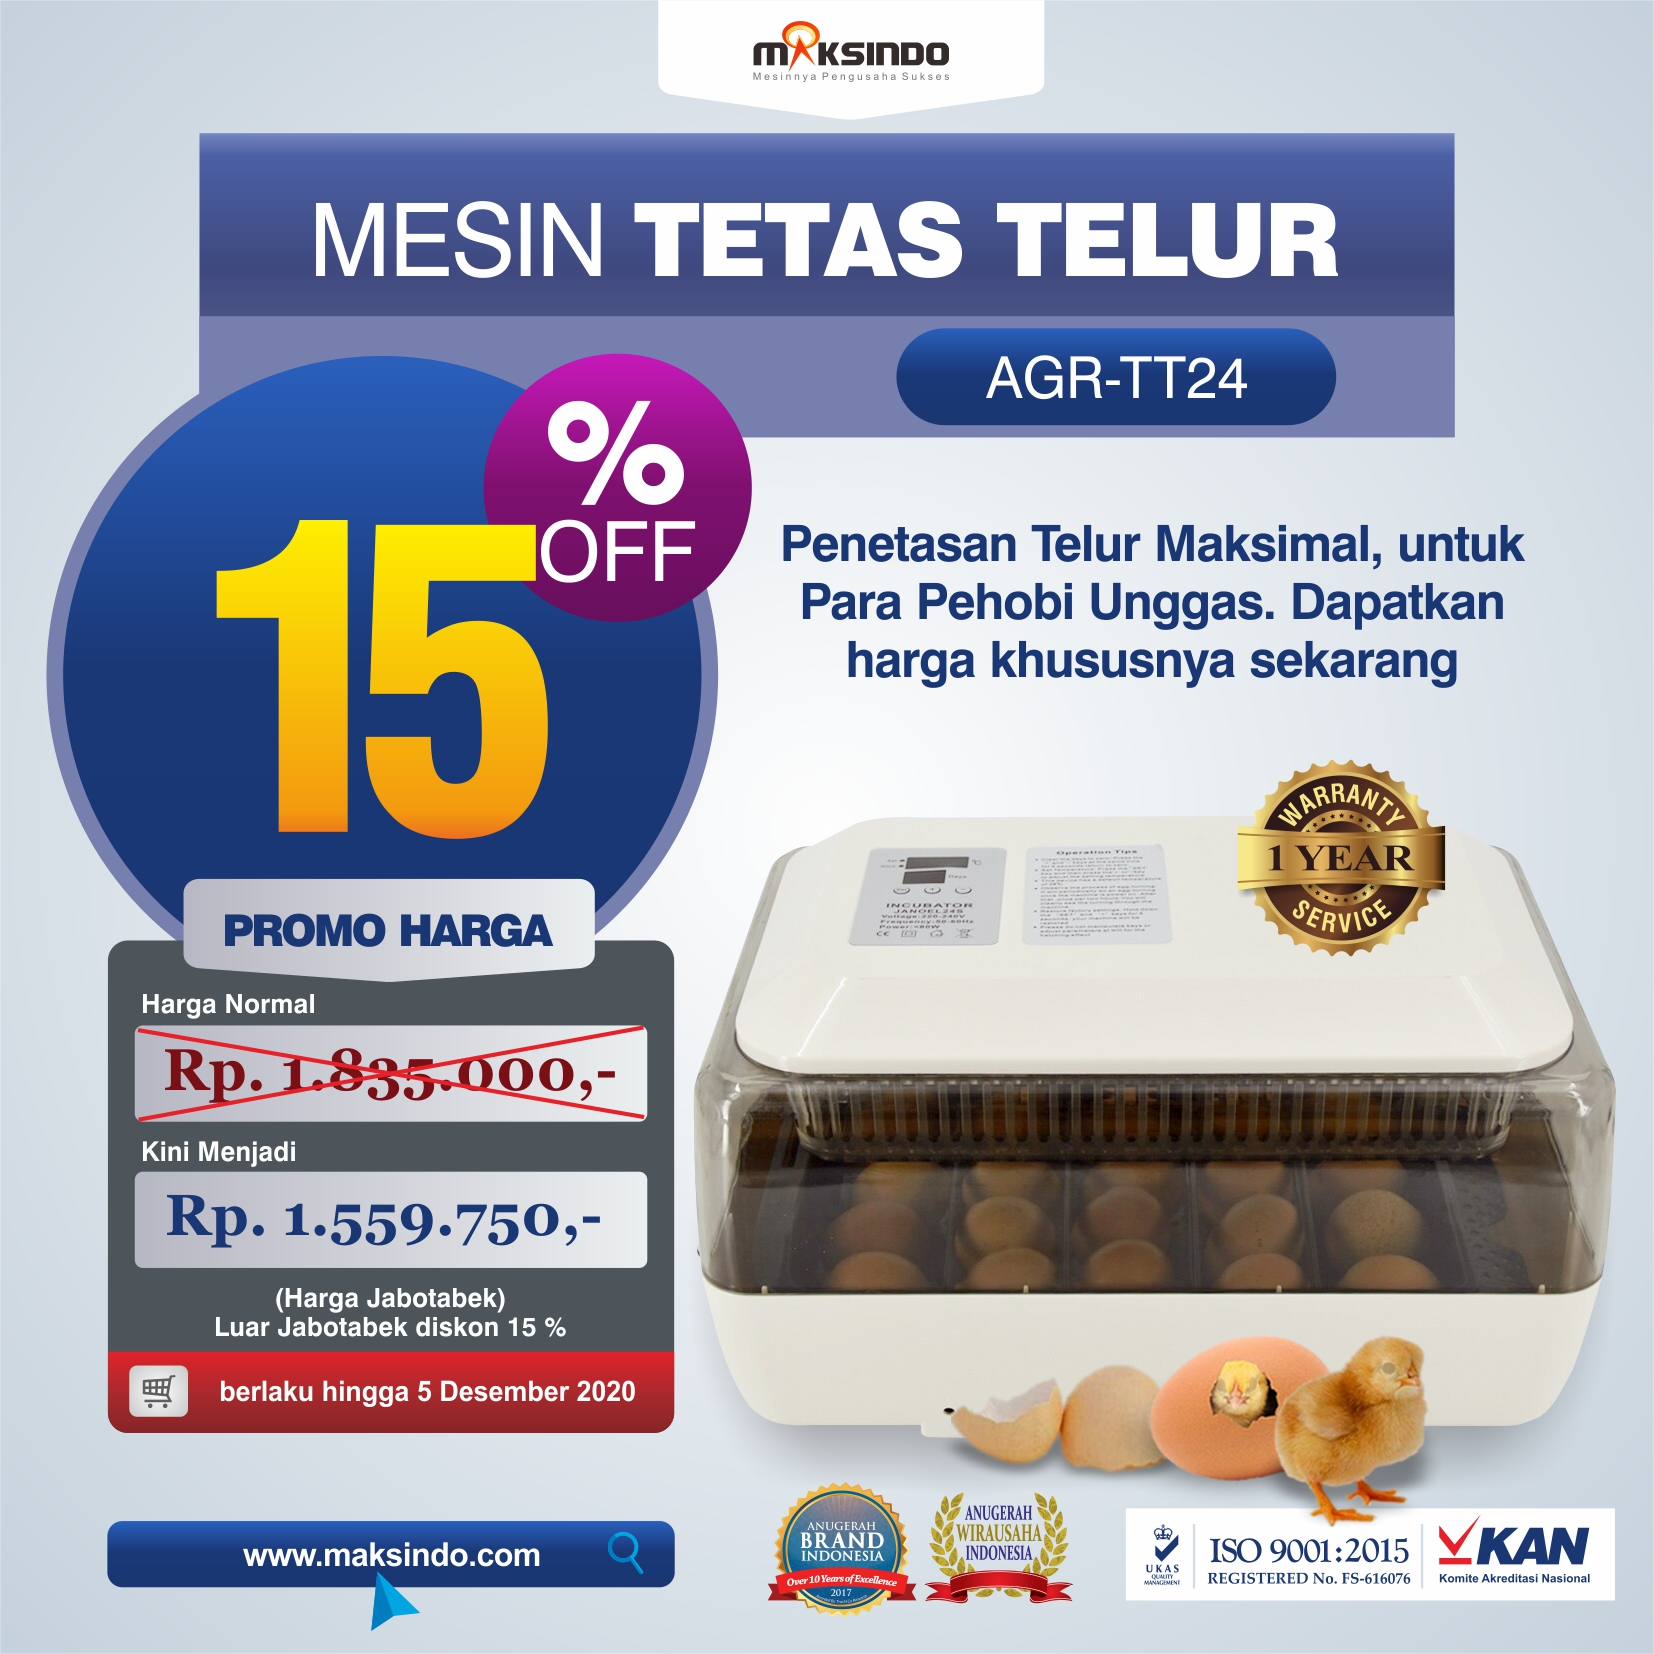 Jual Mesin Penetas Telur di Medan